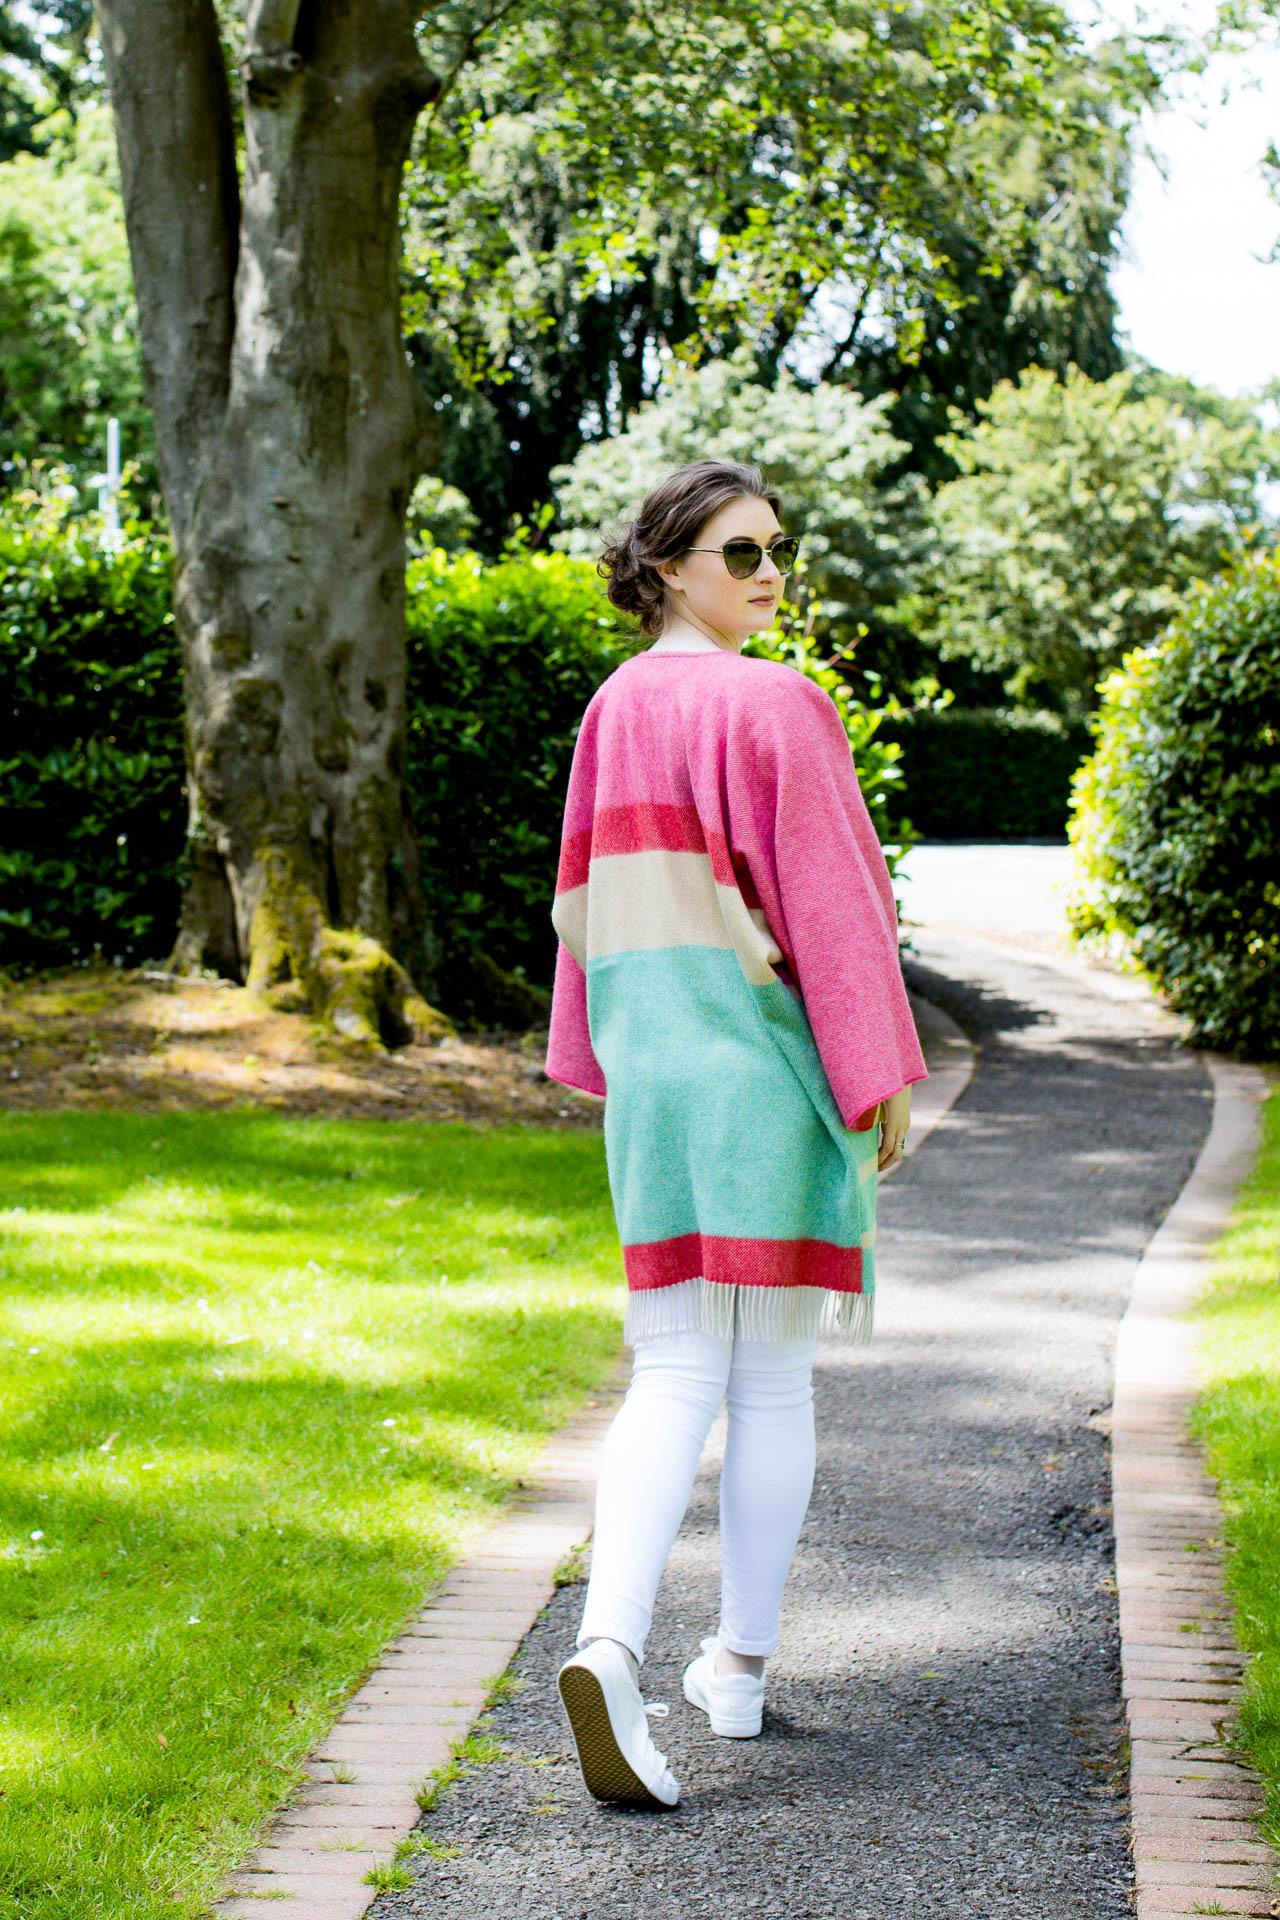 lifestyle fashion photo of textile product